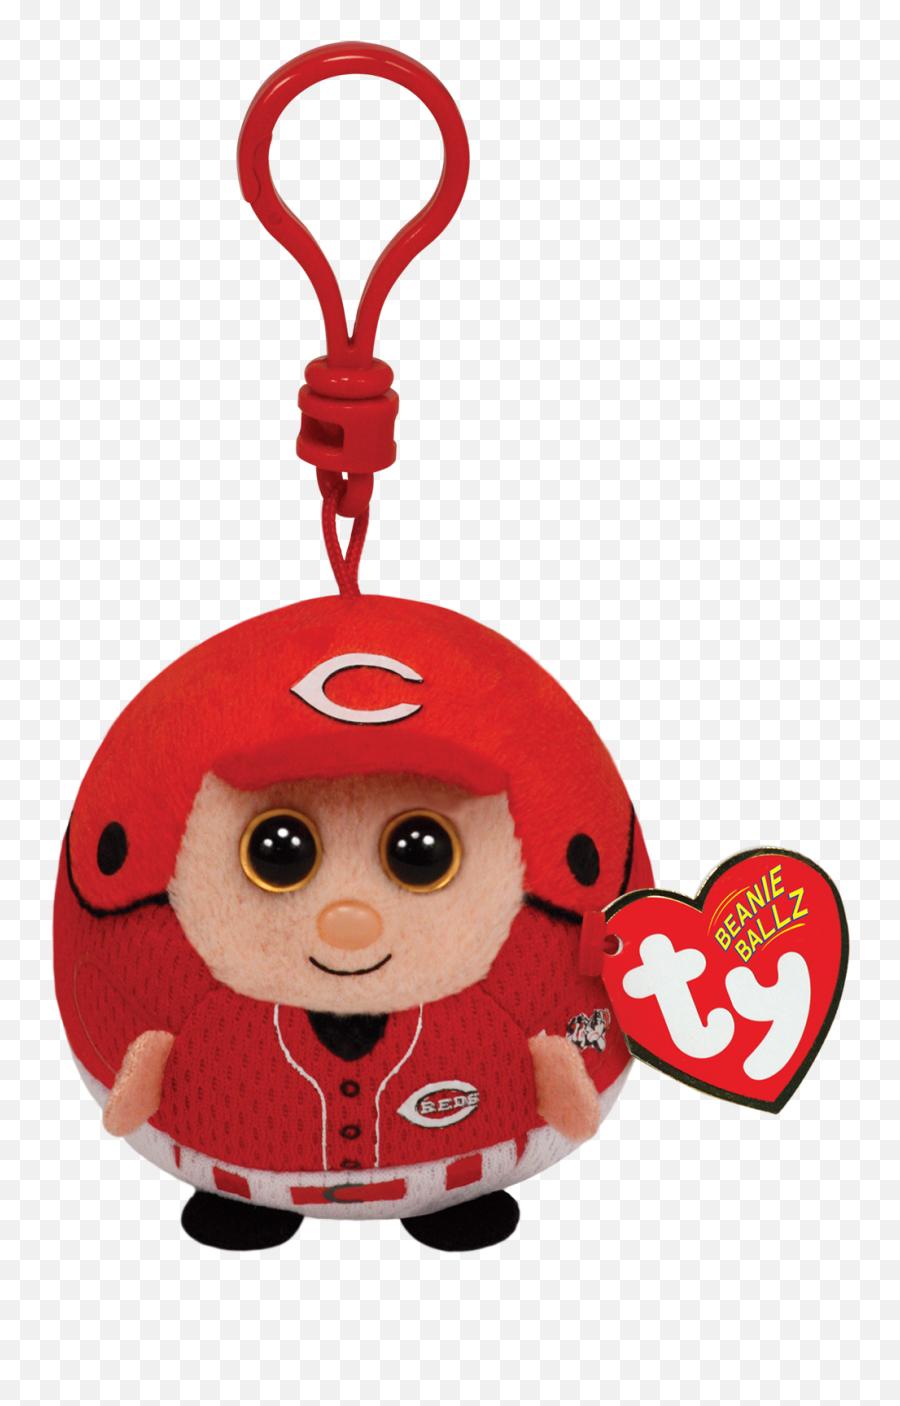 Cincinnati Reds - Mlb Clip Beanie Baby Png,Cincinnati Reds Logo Png